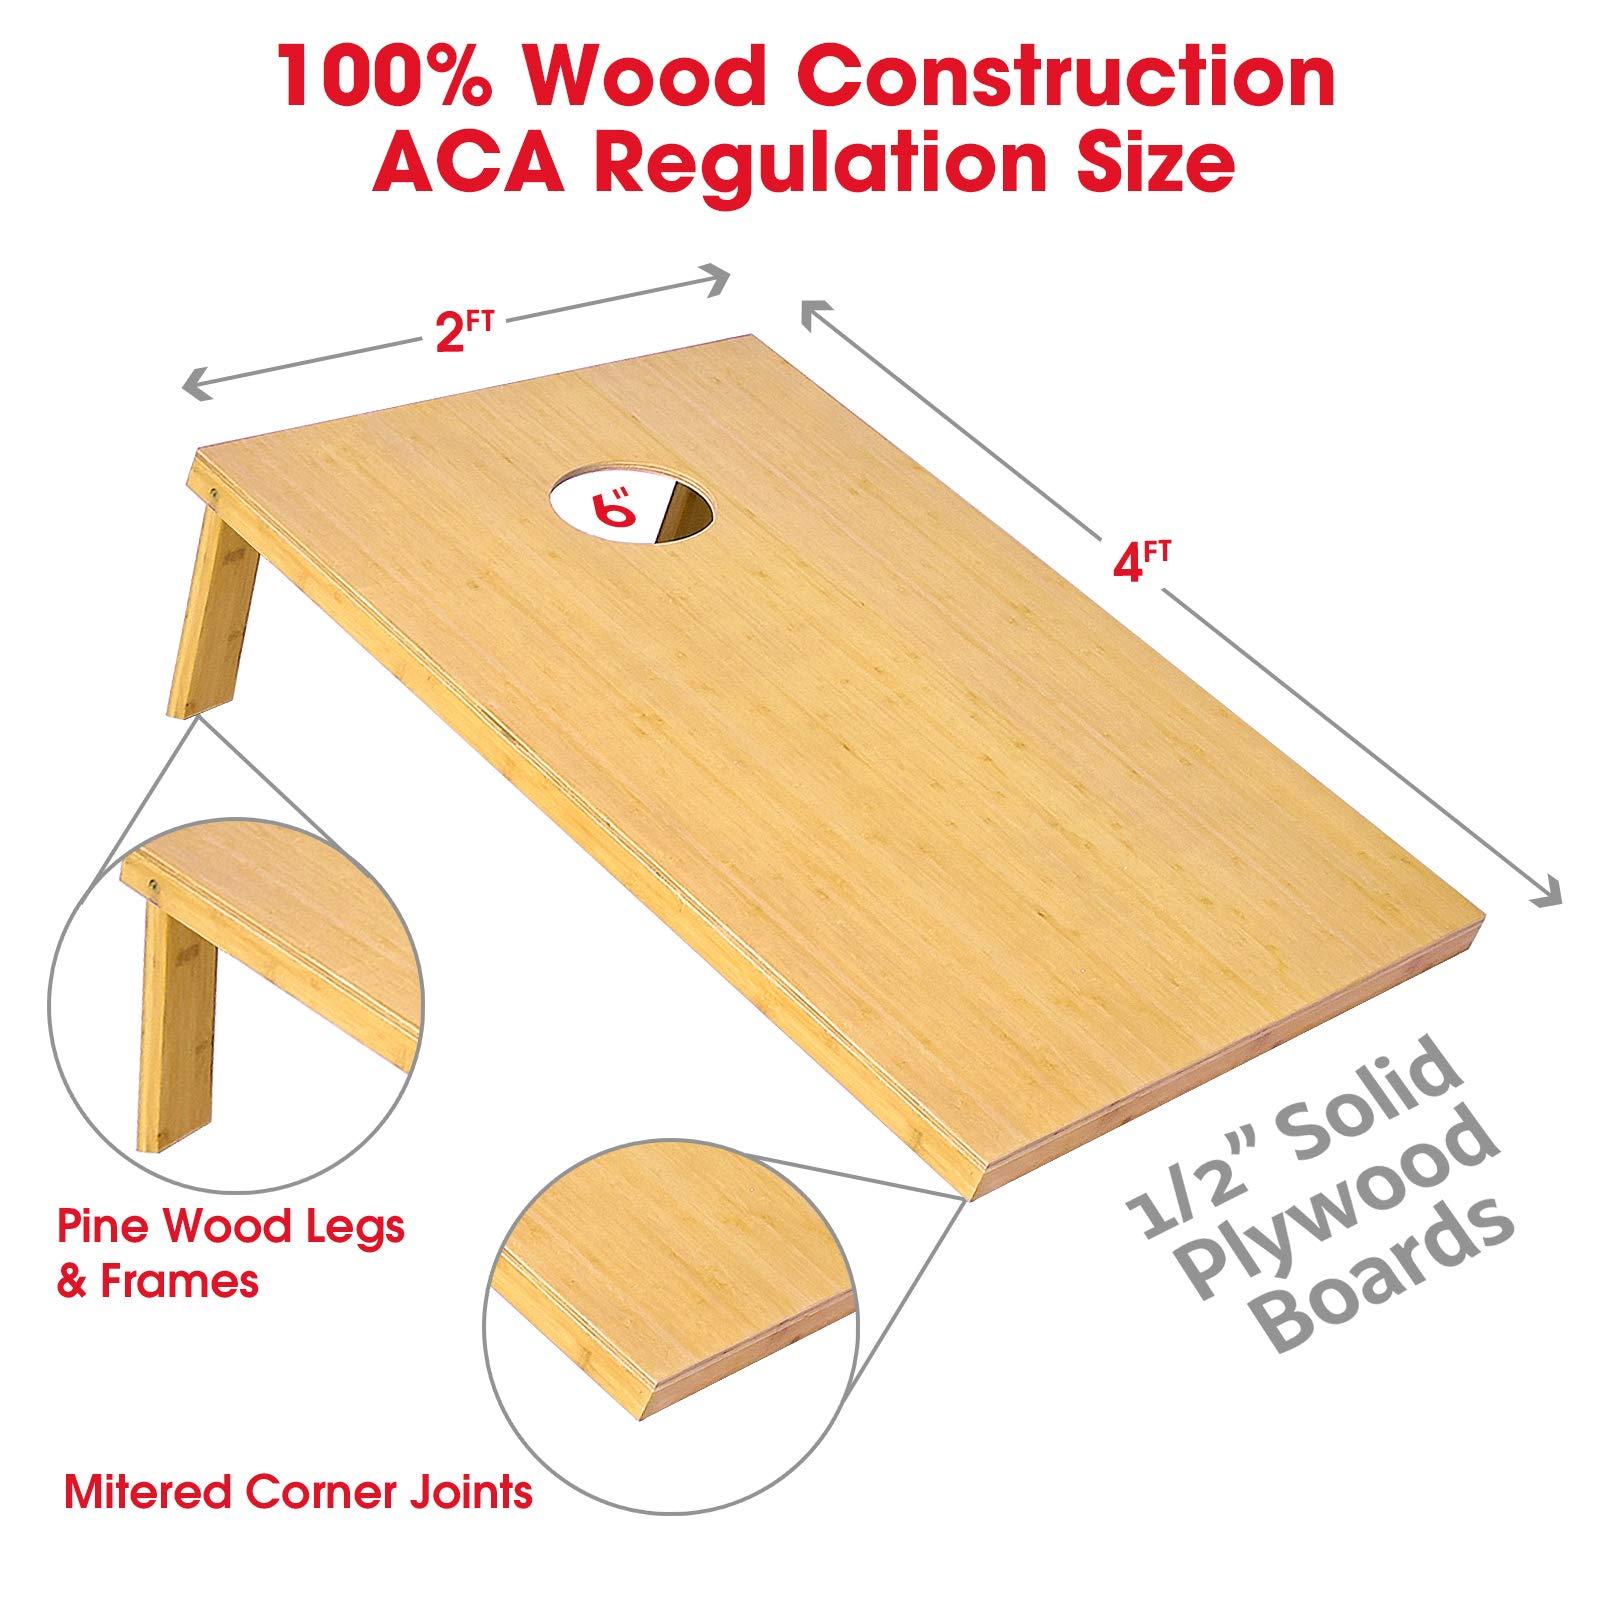 GoSports Bamboo Regulation Size Bamboo Cornhole Set   Includes 8 Bean Bags & Carrying Case by GoSports (Image #2)